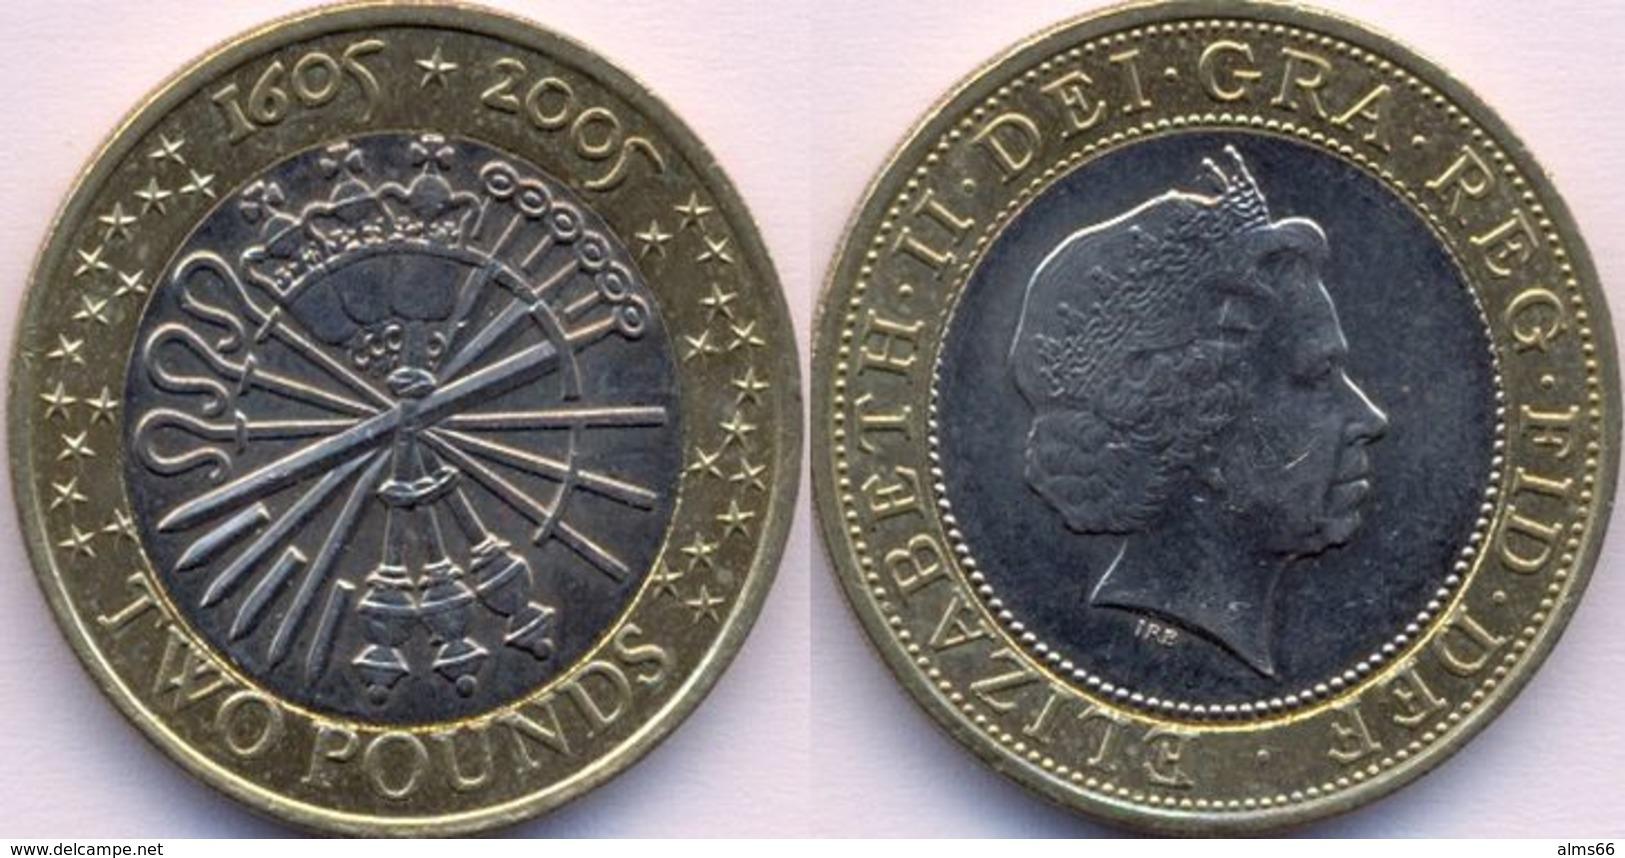 Great Britain UK 2 Pound 2005 VF  - Commemorative - - 1971-… : Decimal Coins